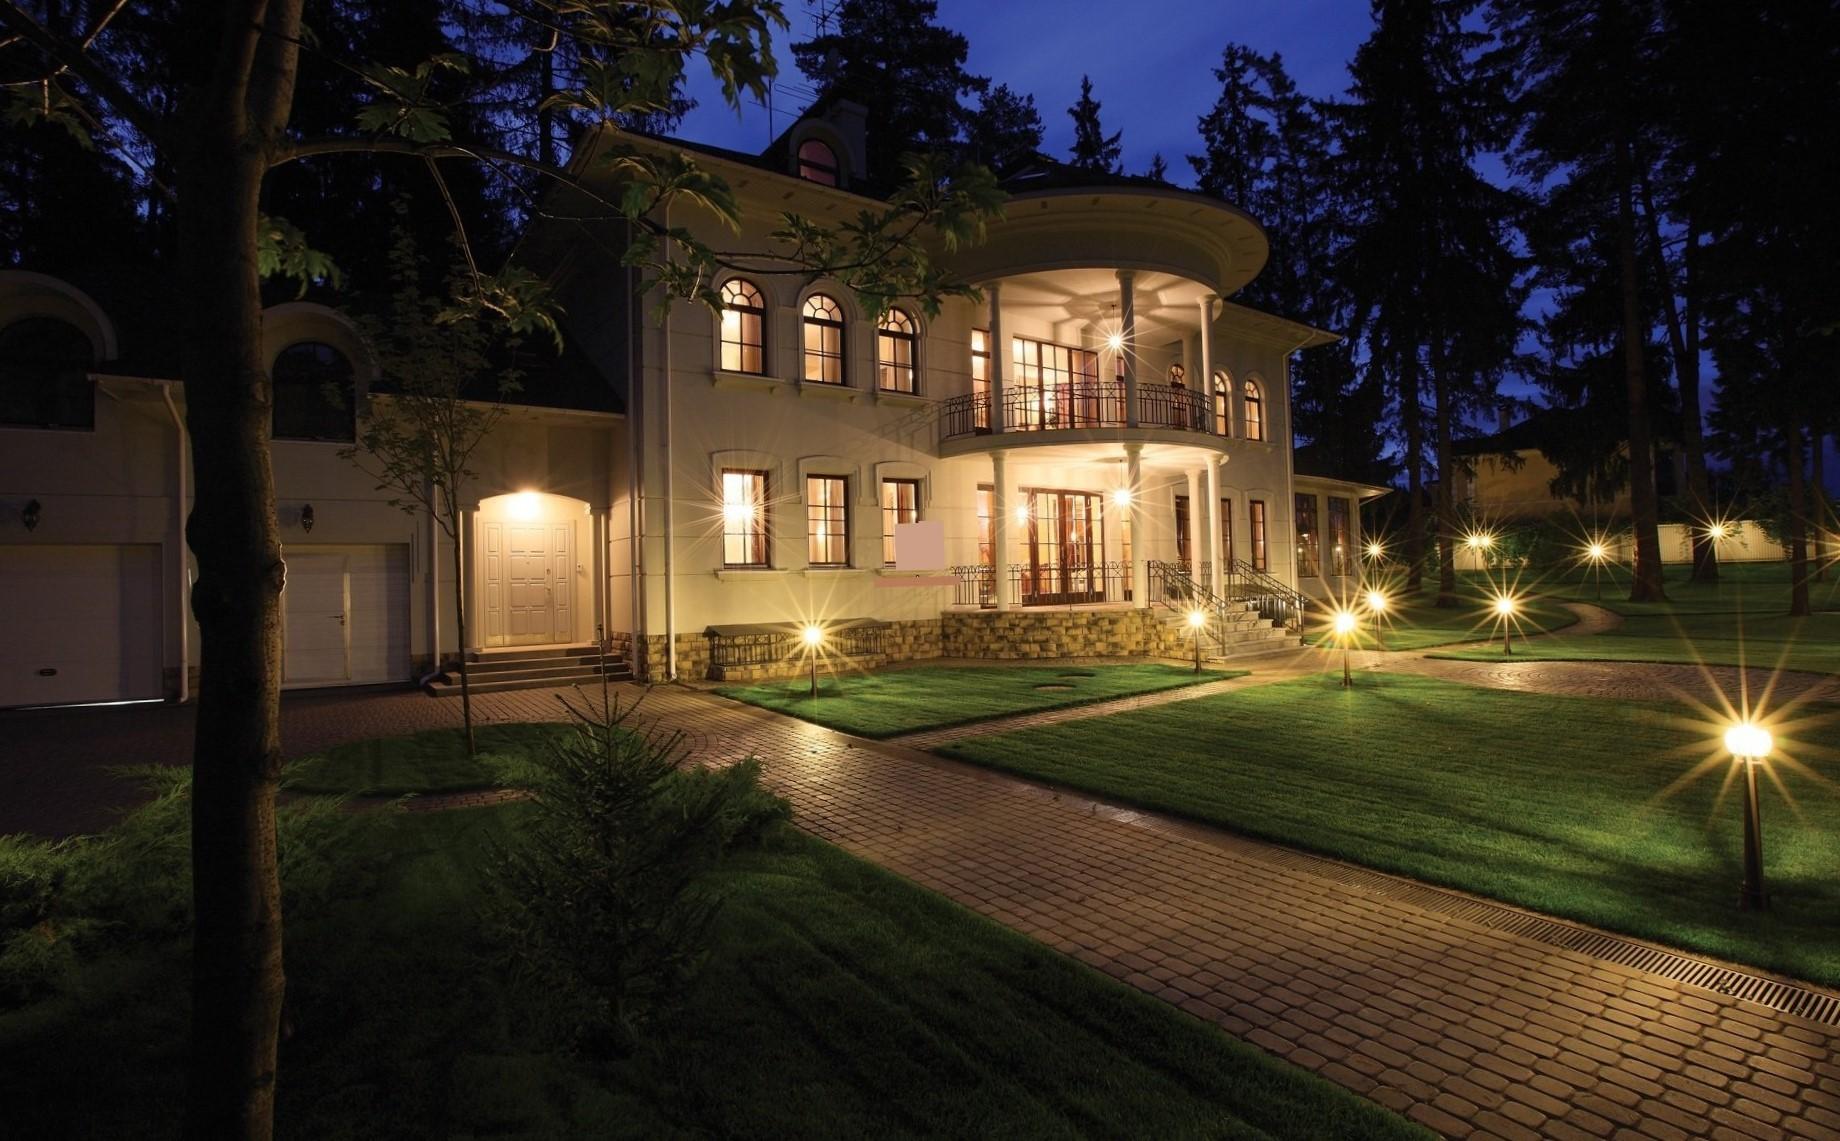 изображение подсветки фасада дома